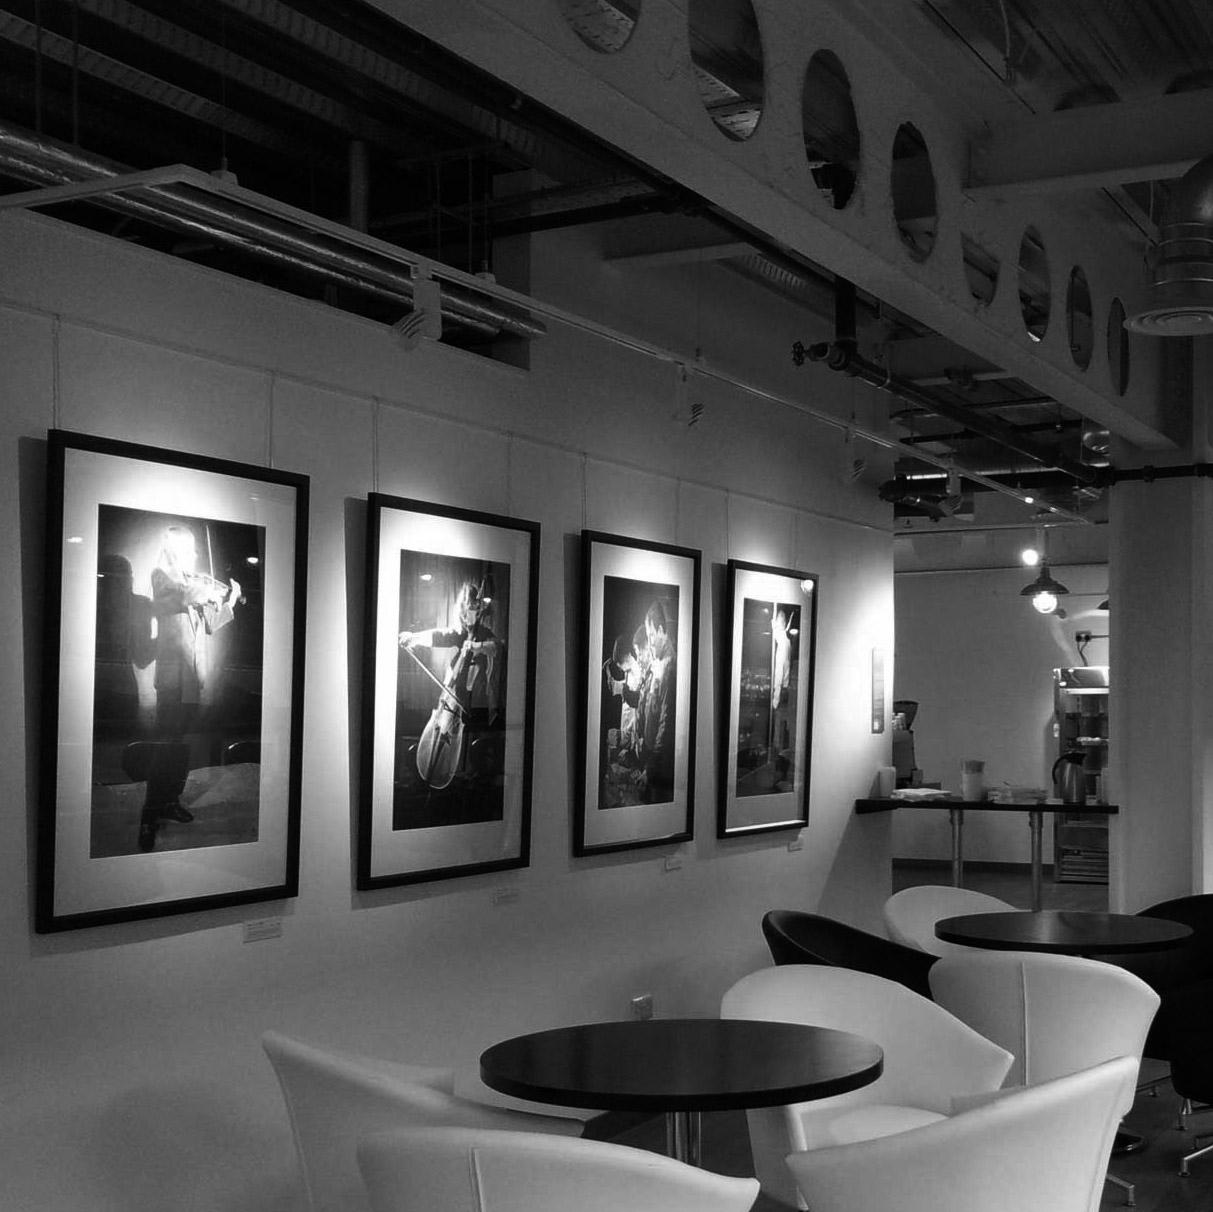 Diplomats coffee shop